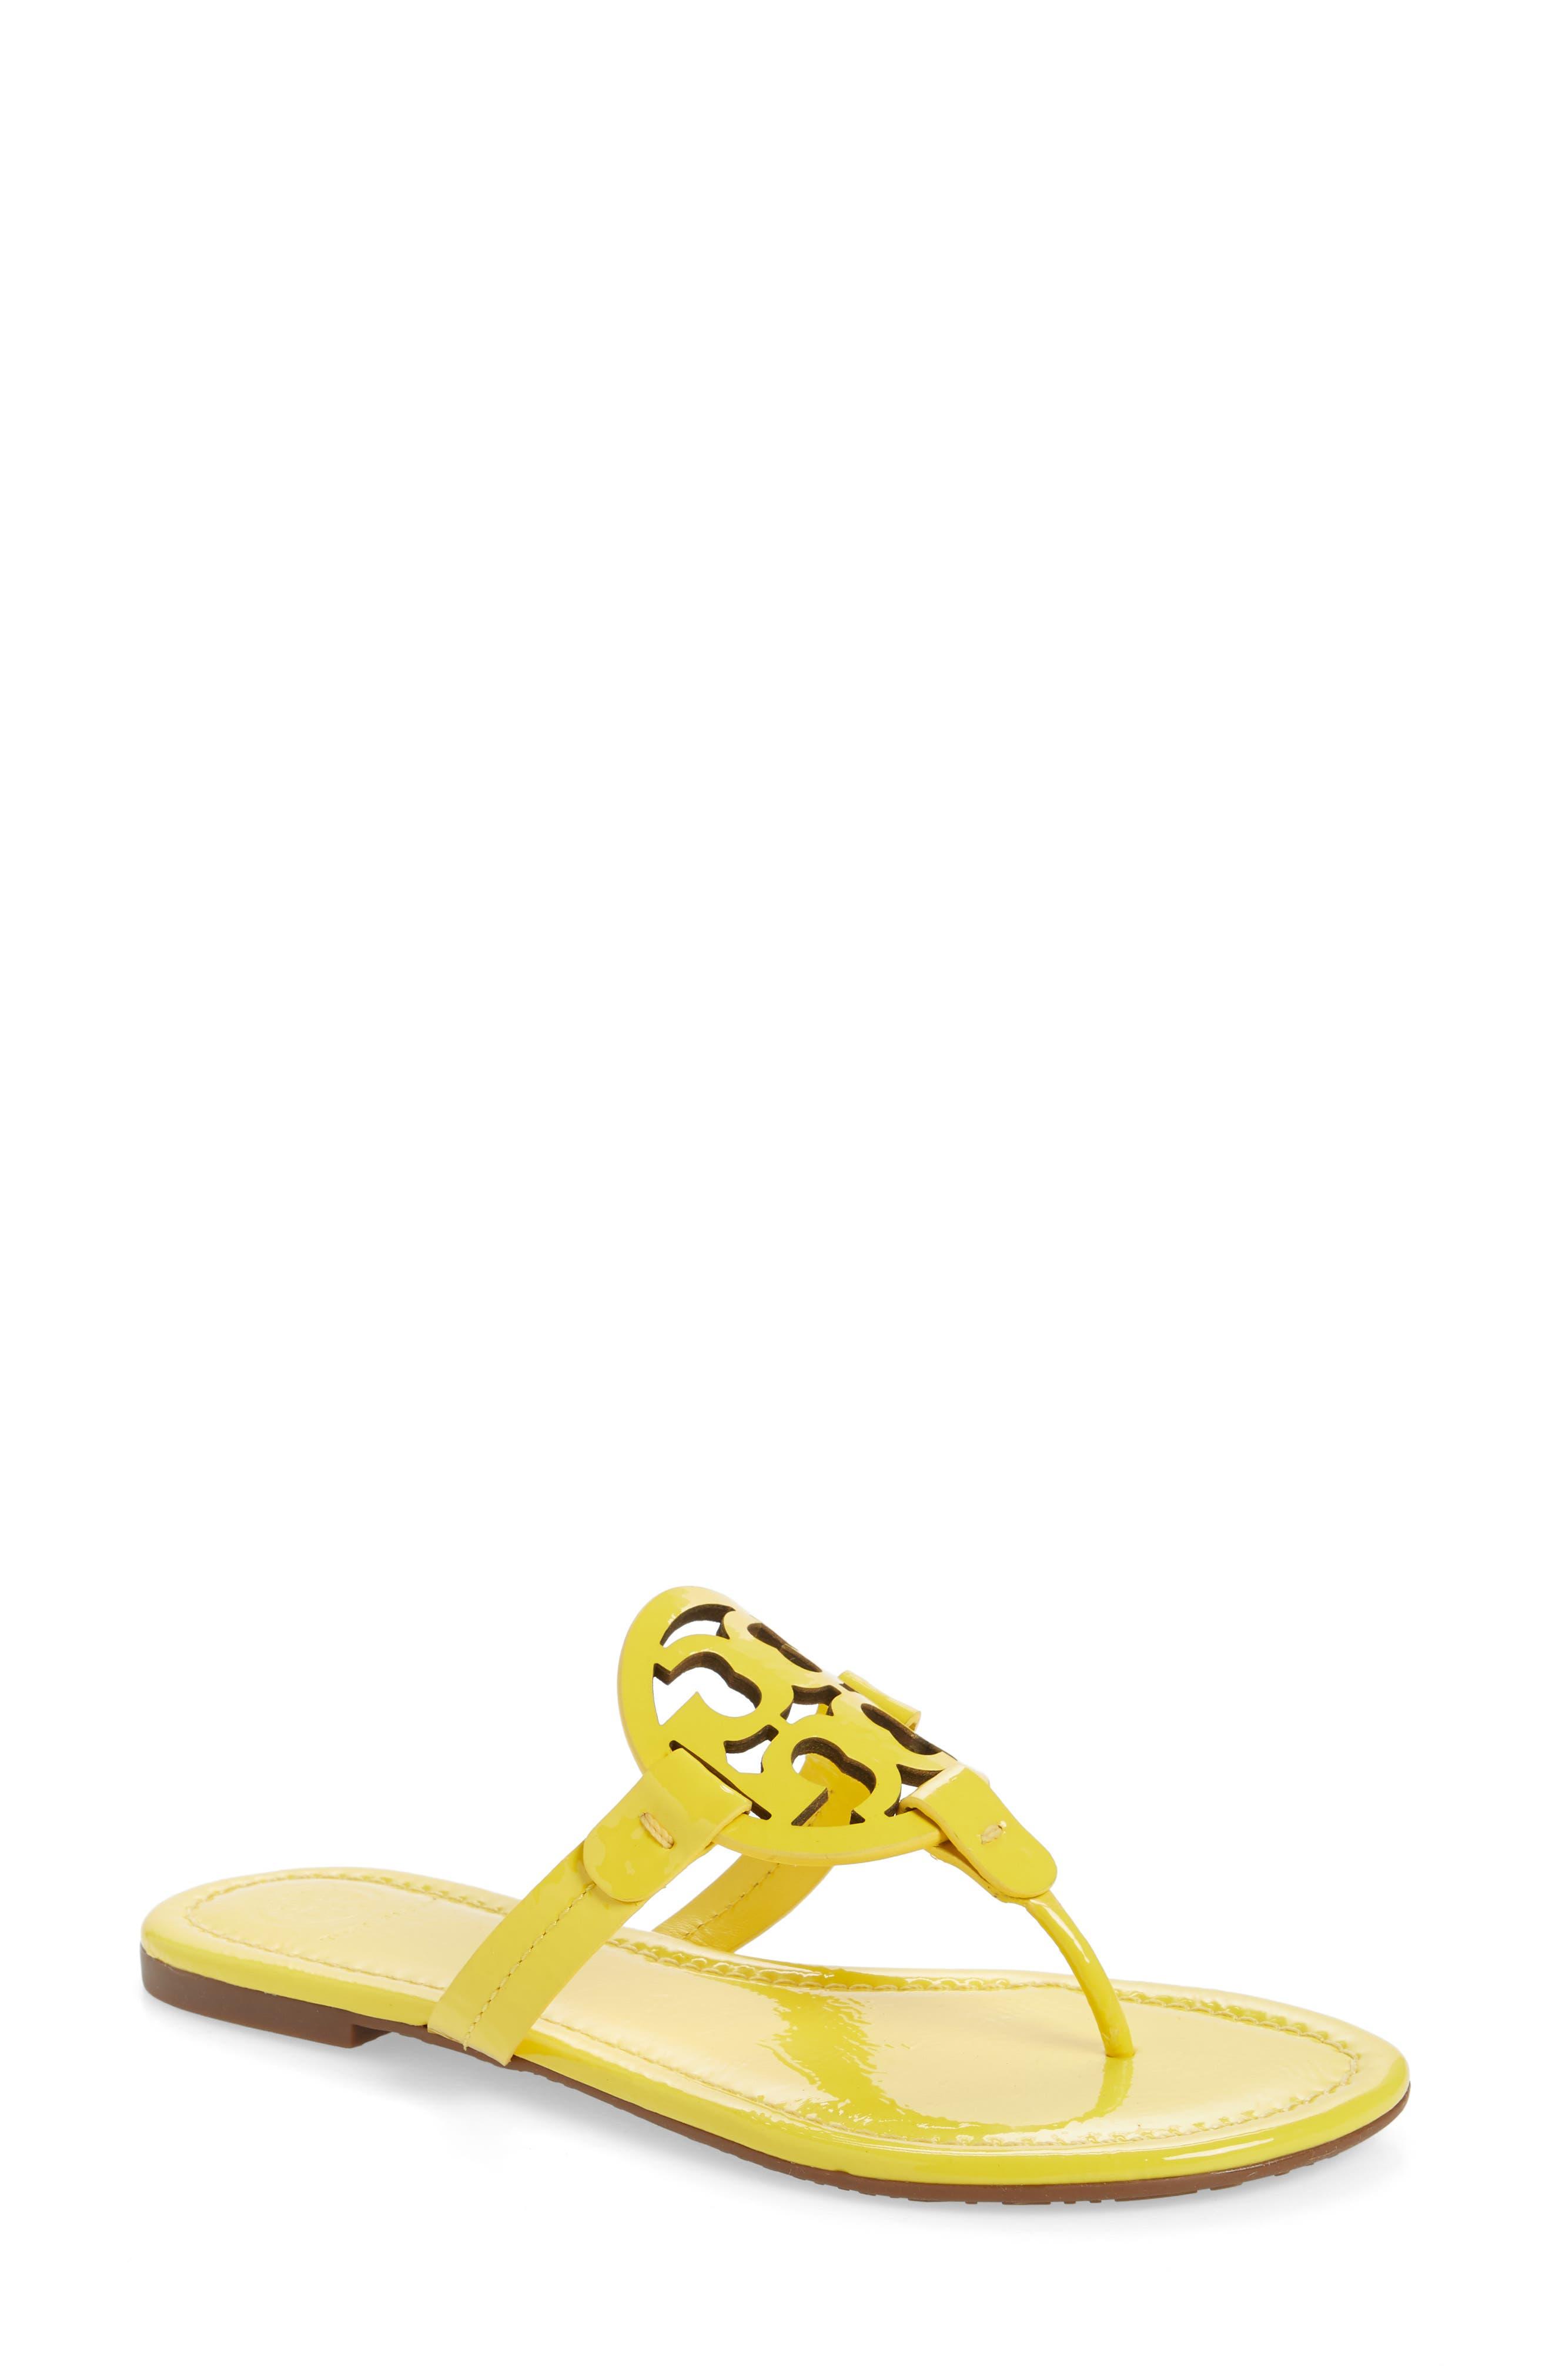 Women's Yellow Shoes Sale \u0026 Clearance